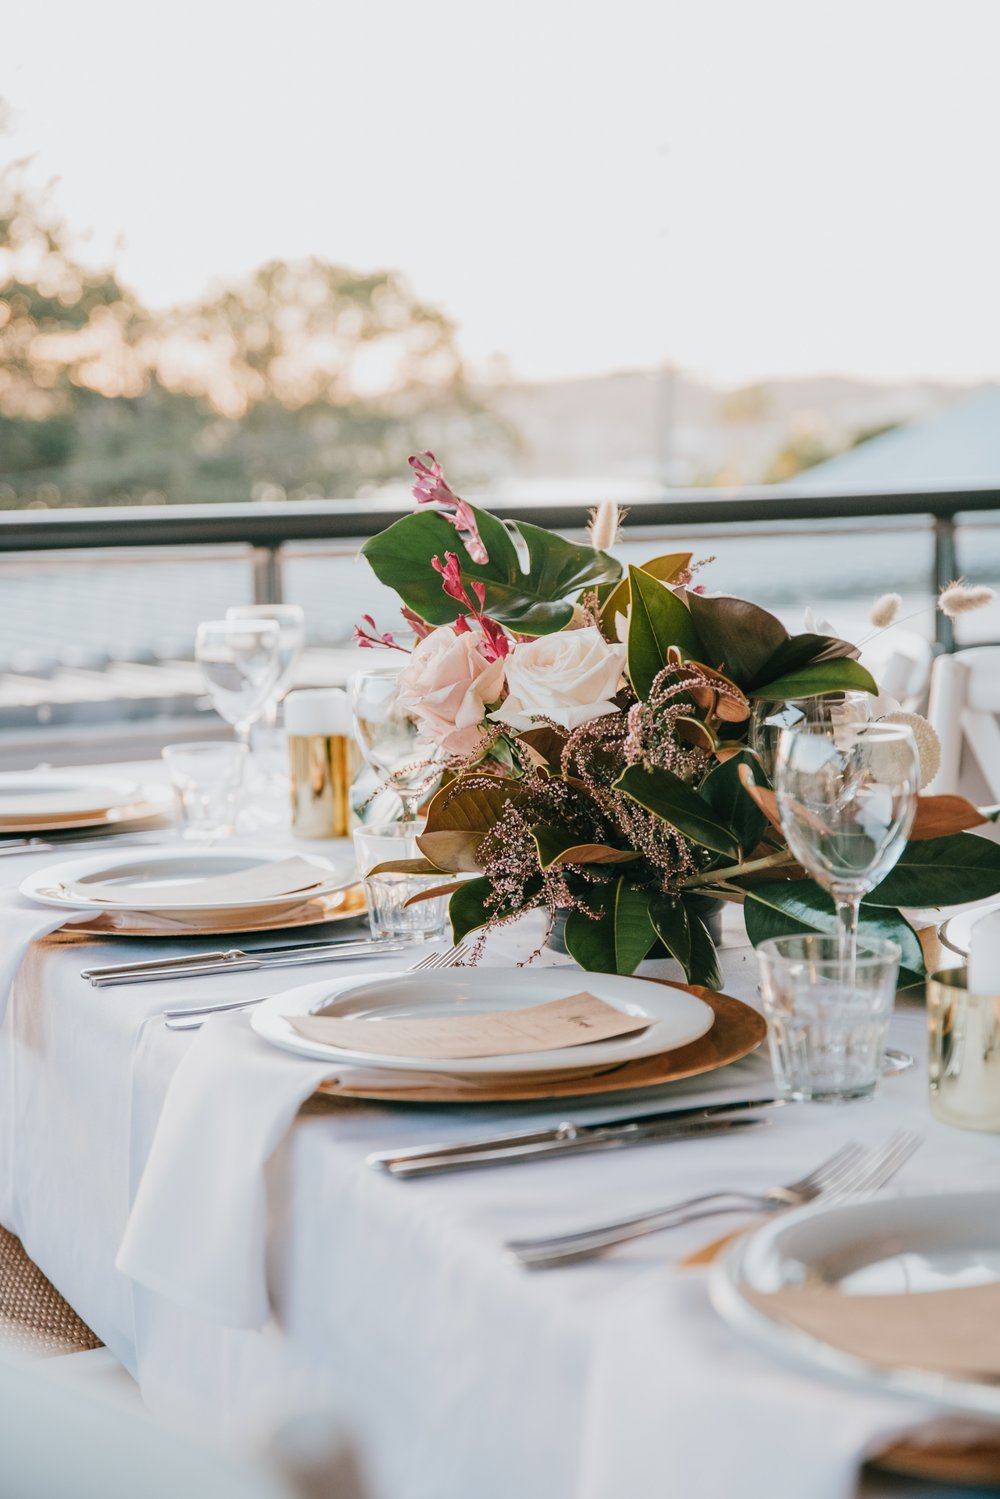 Gunyah Wedding _ Accommodation Photoshoot (18th July 2018) - Full Res-141.jpg